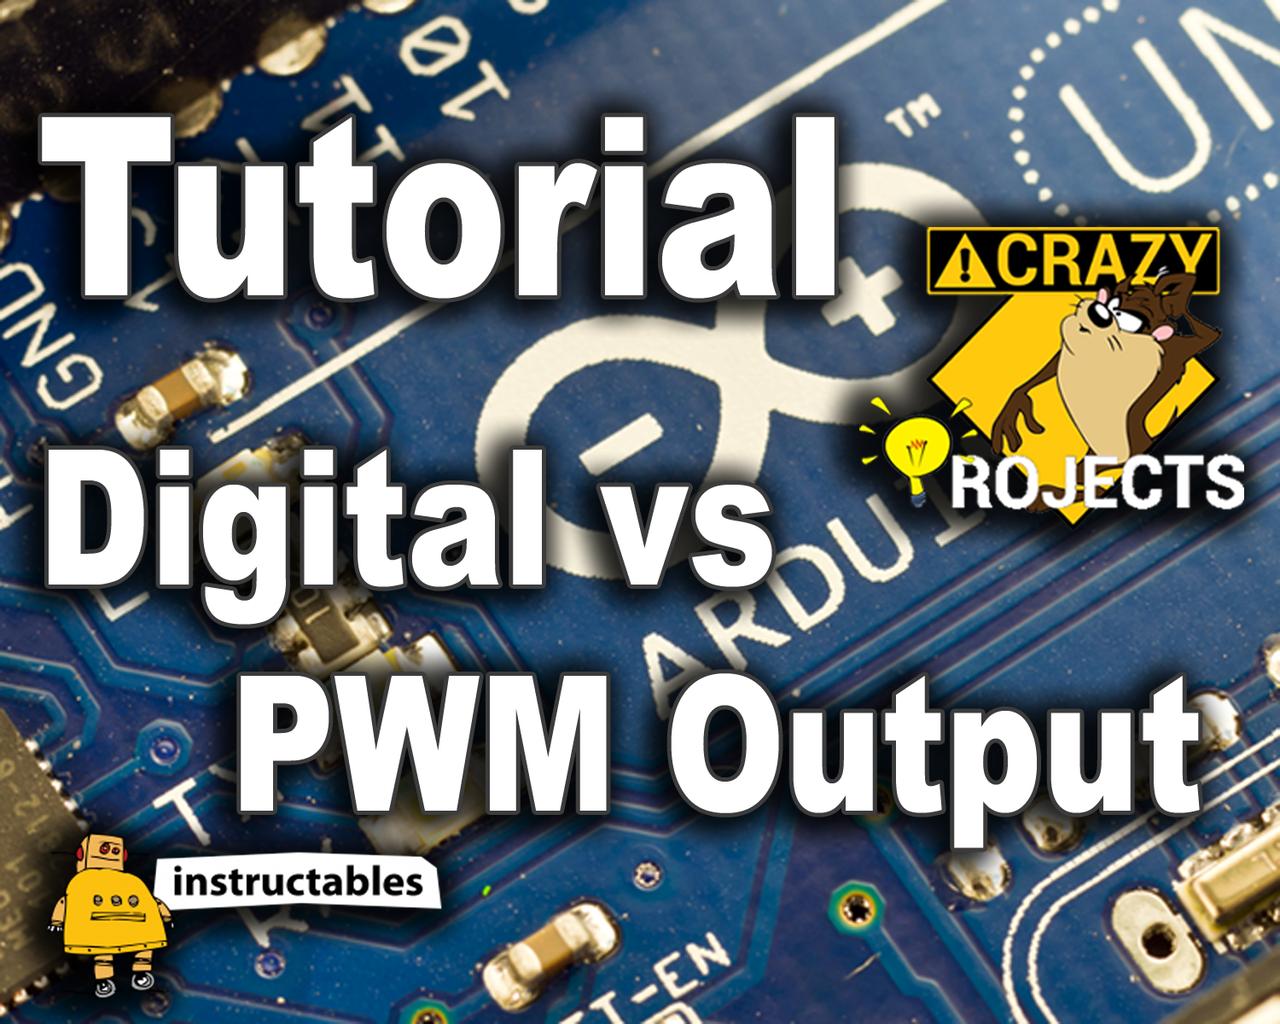 Arduino Tutorial - Digital Vs PWM Output